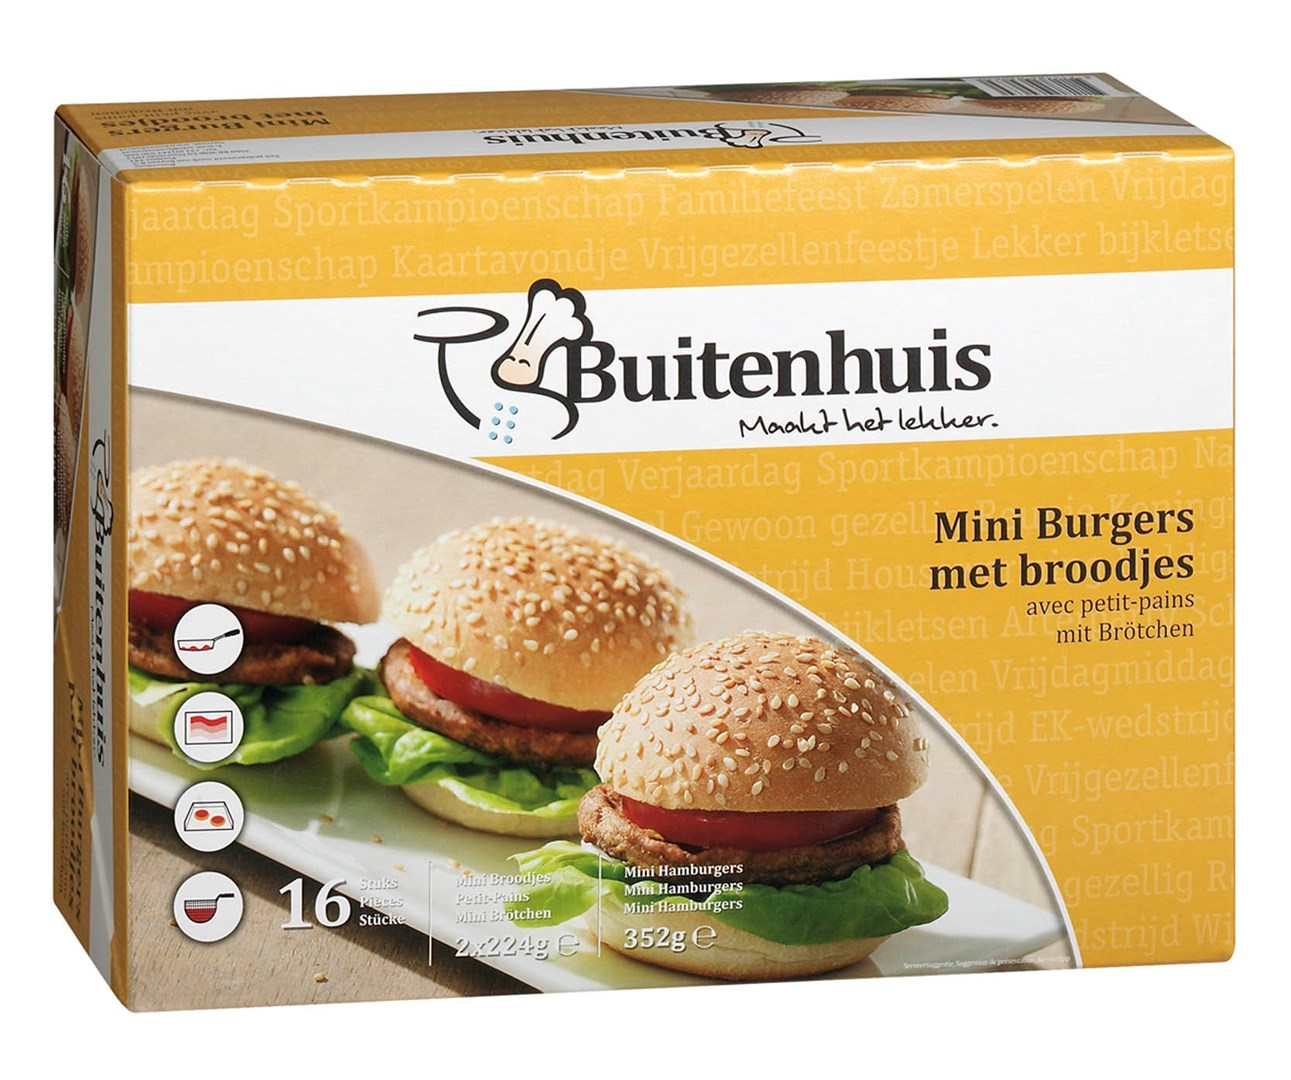 Productafbeelding Buitenhuis Mini burgers met broodjes 16x47 gram